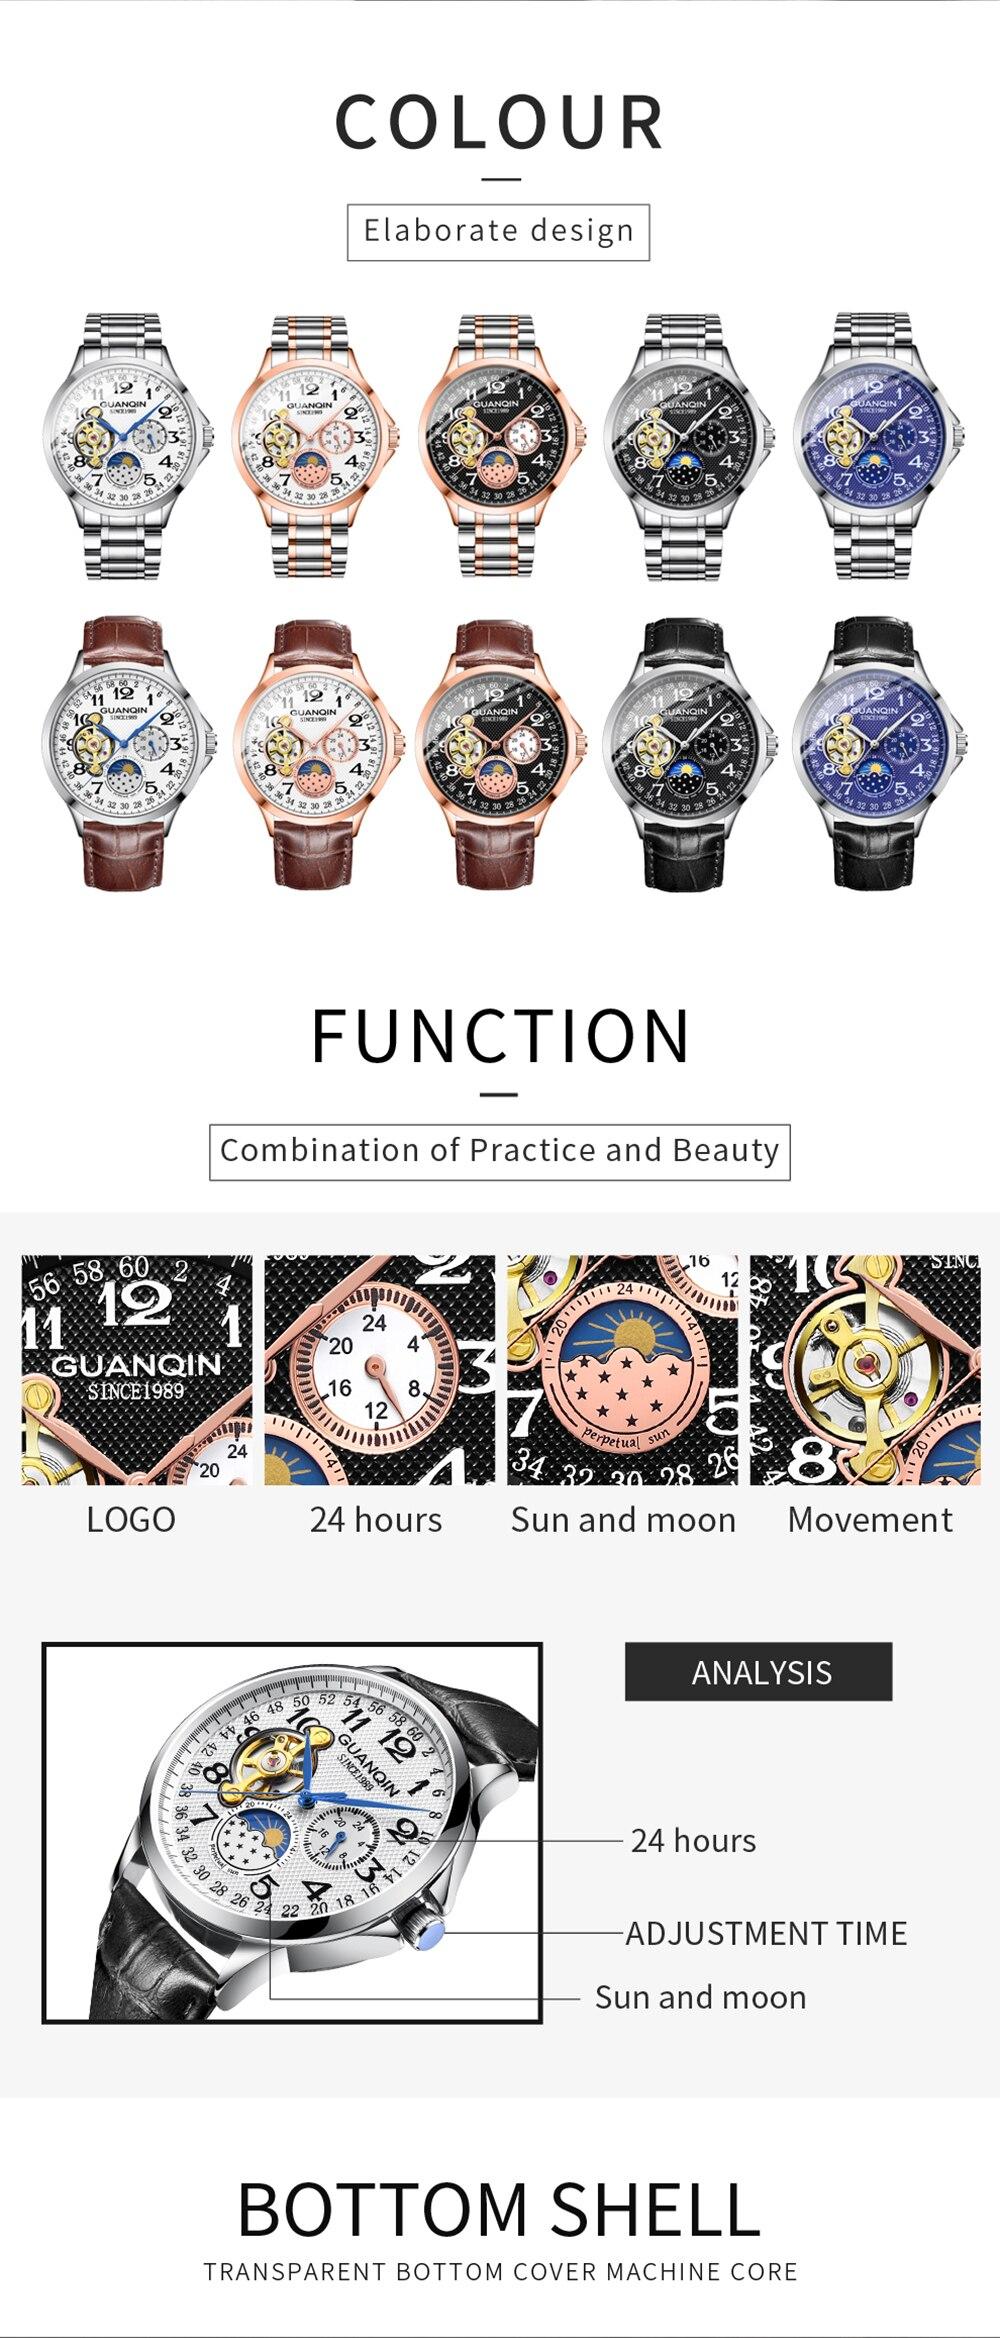 HTB1TW61XL1H3KVjSZFHq6zKppXaP GUANQIN mechanical watch men waterproof automatic skeleton tourbillon clock men business top brand luxury Relogio Masculino